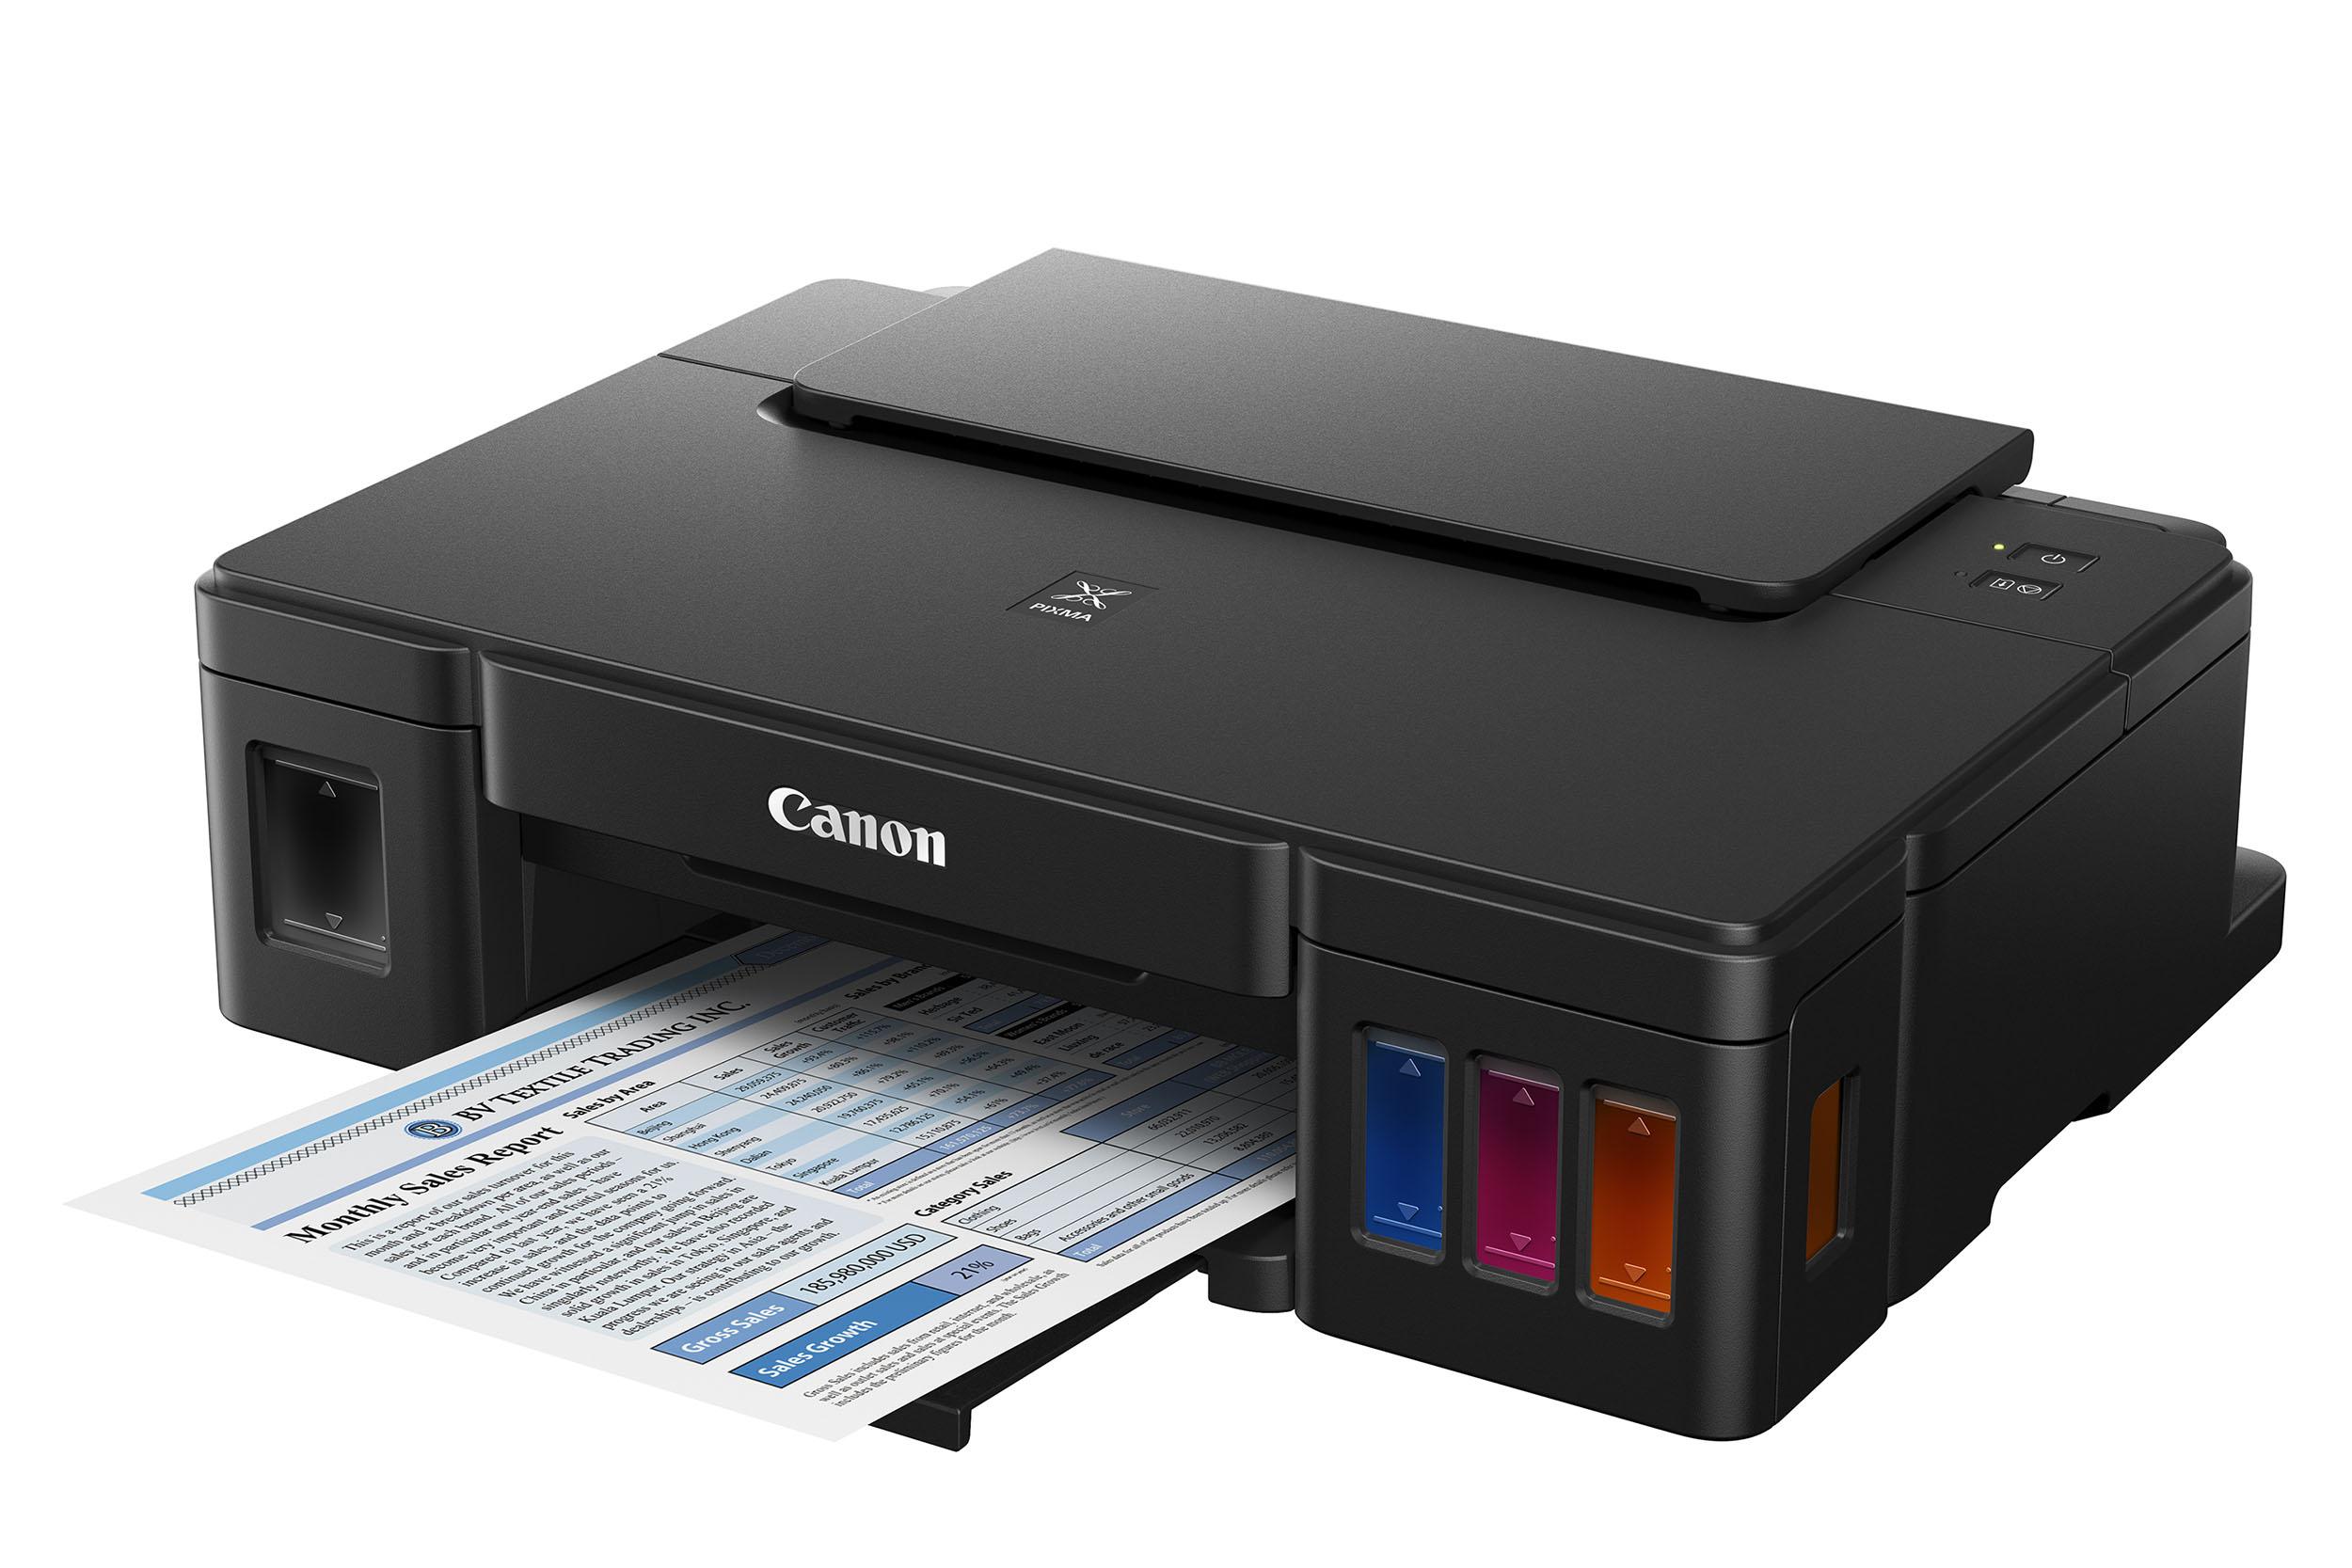 Peluncuran printer Canon Pixma G series